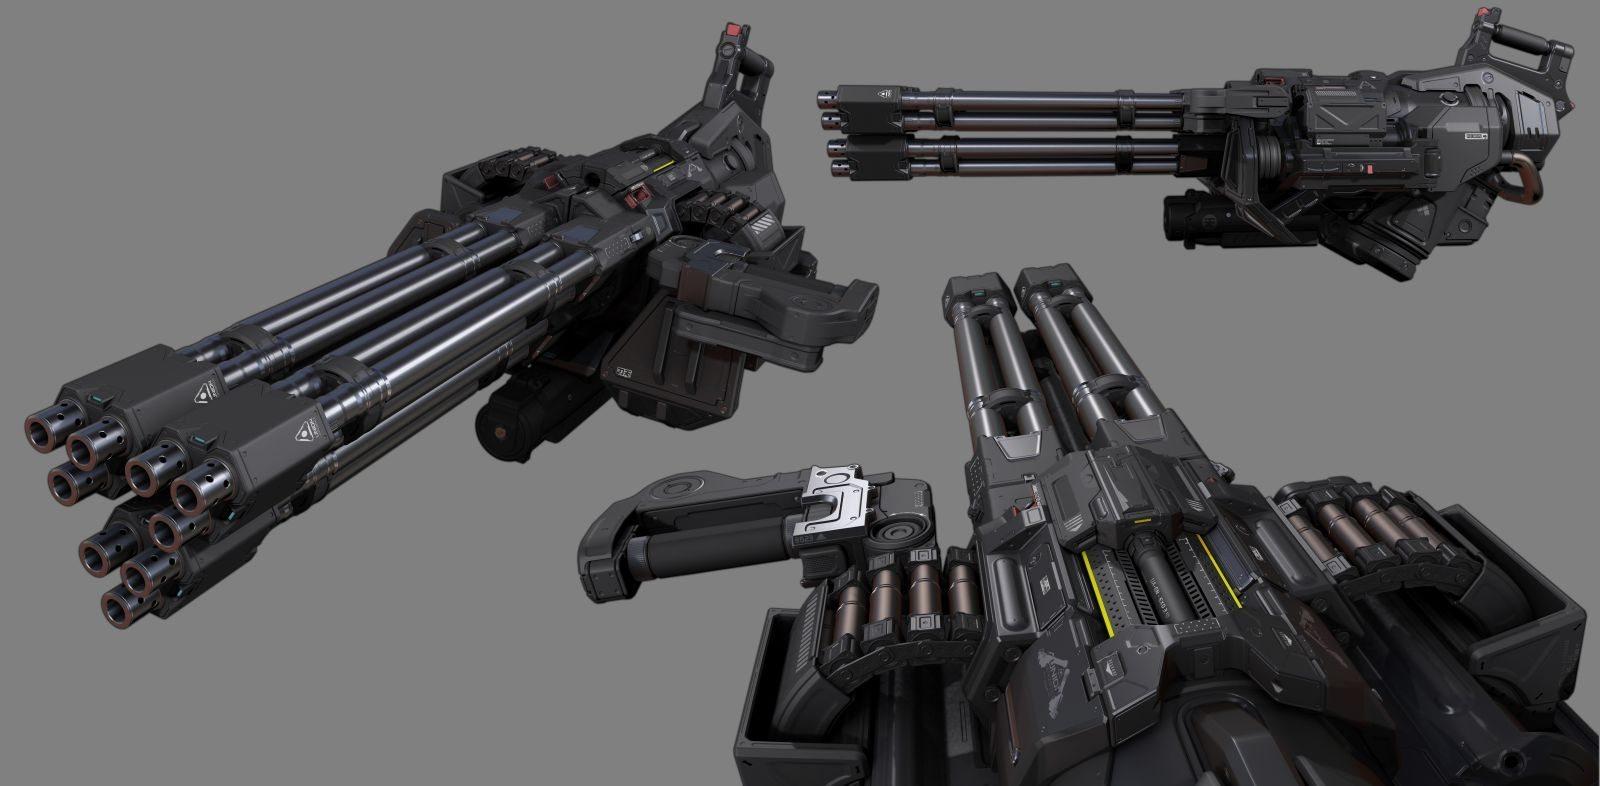 Chaingun Turret Mod